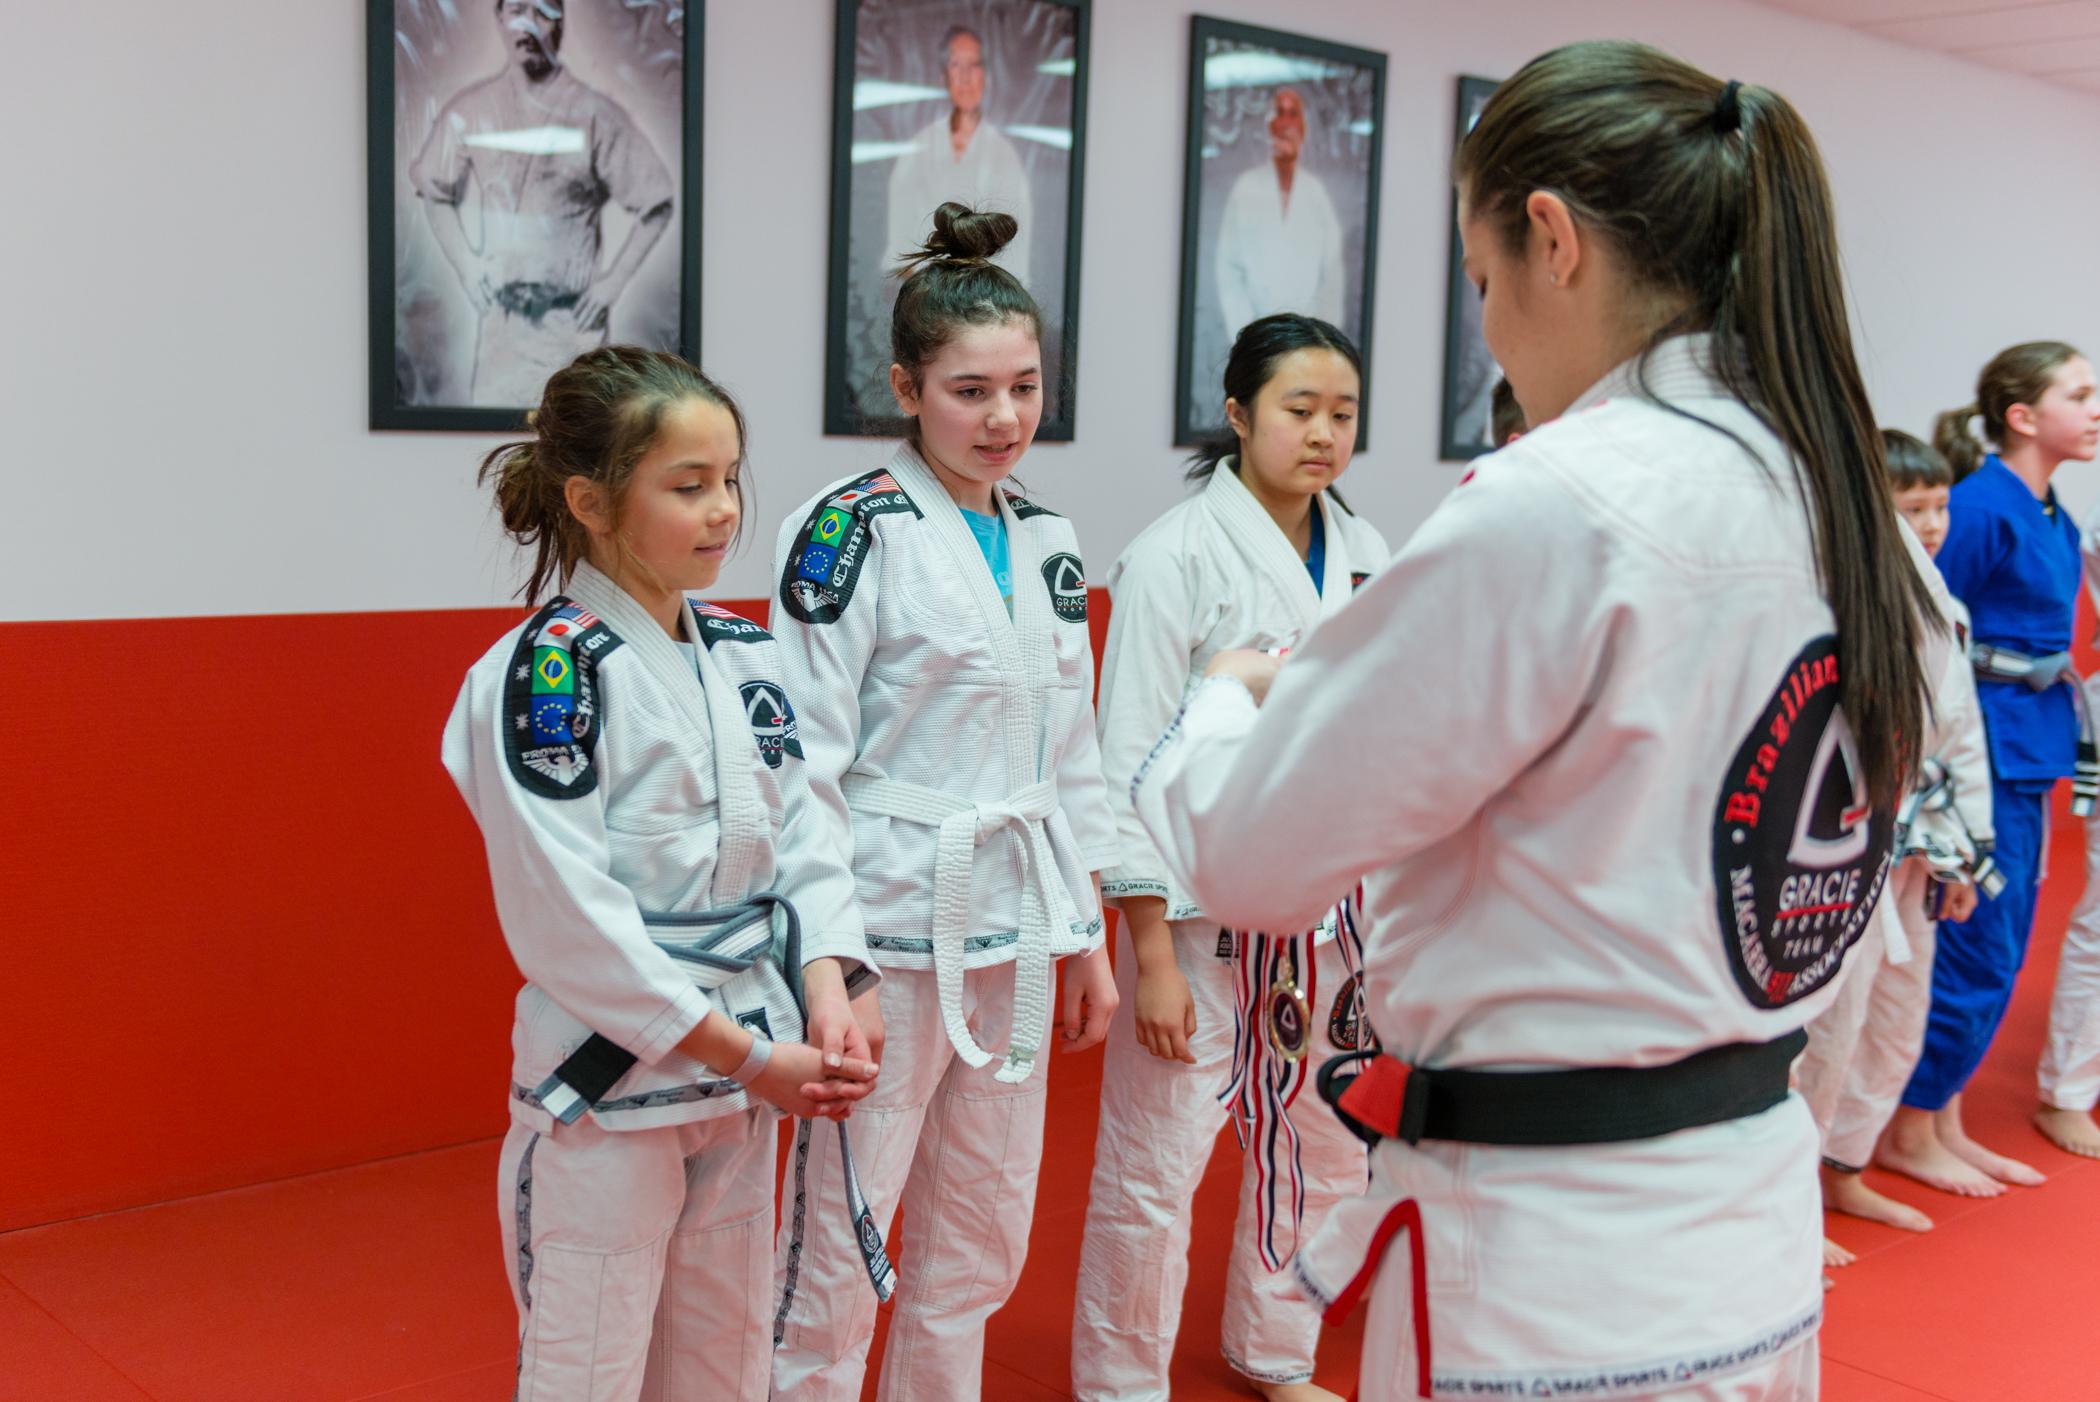 Gracie-Sports-Kids-117.jpg